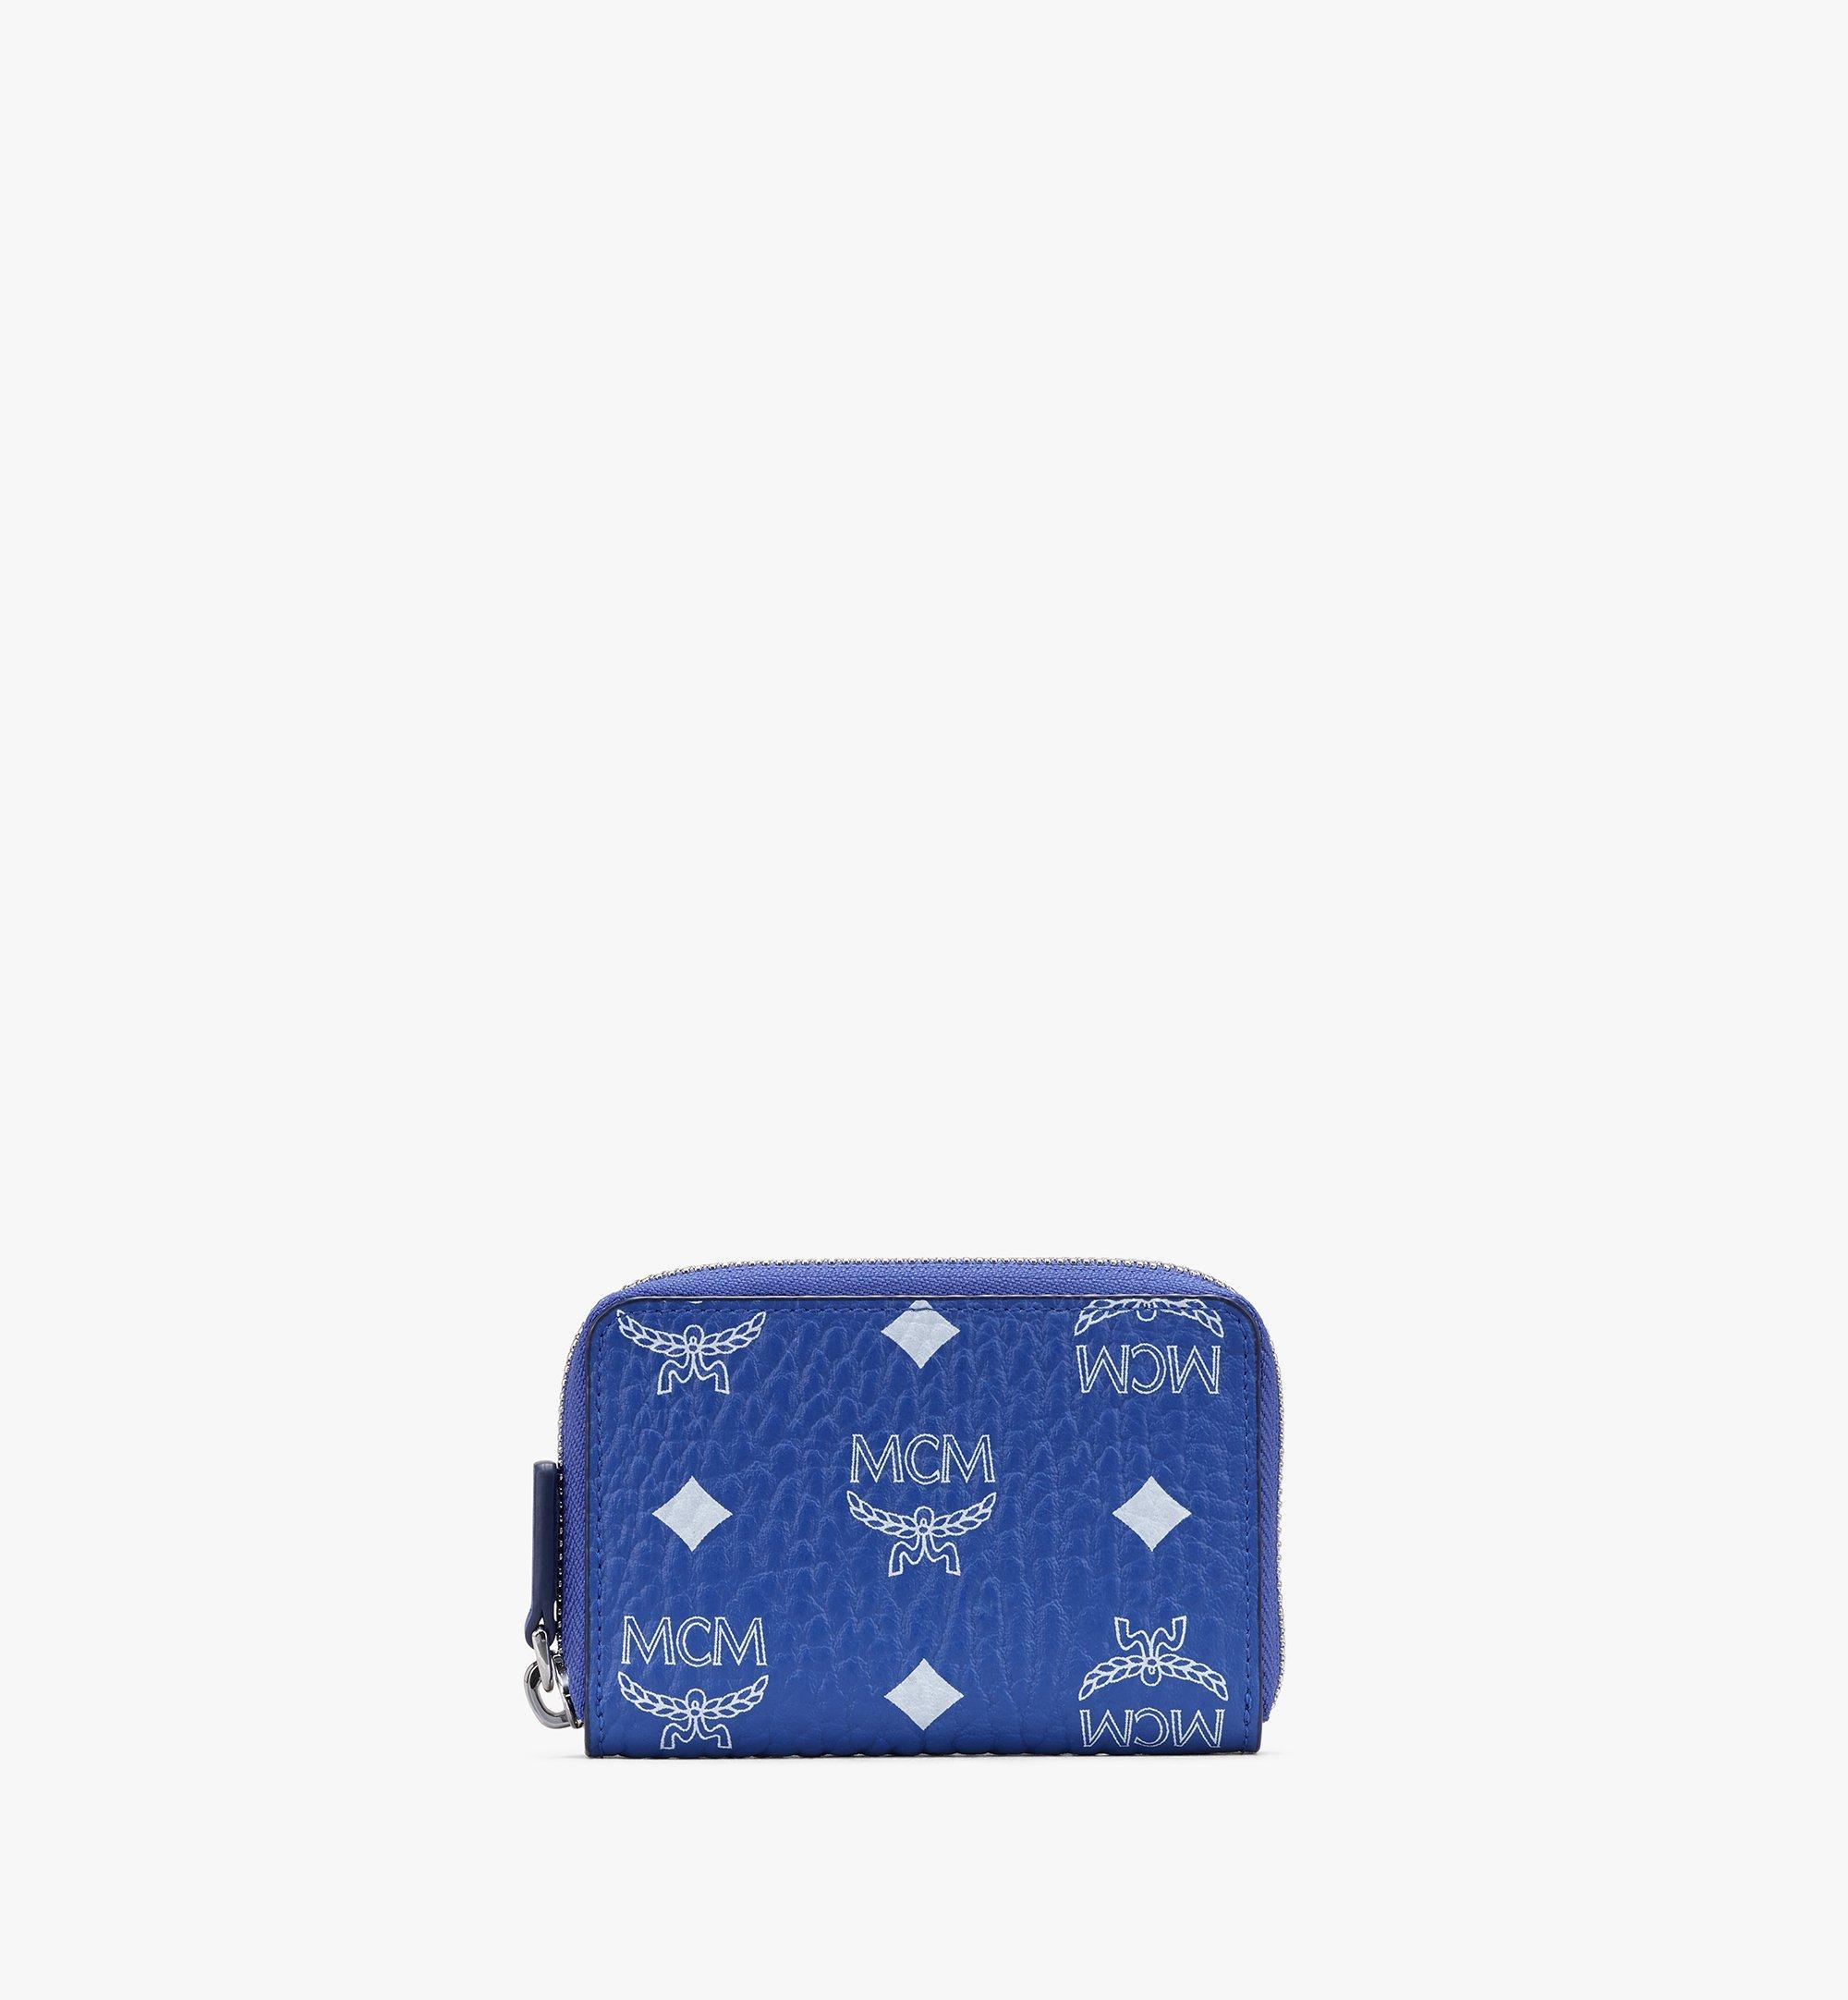 MCM Zip Around Card Wallet in Visetos Blue MXLASVI01H1001 Alternate View 1